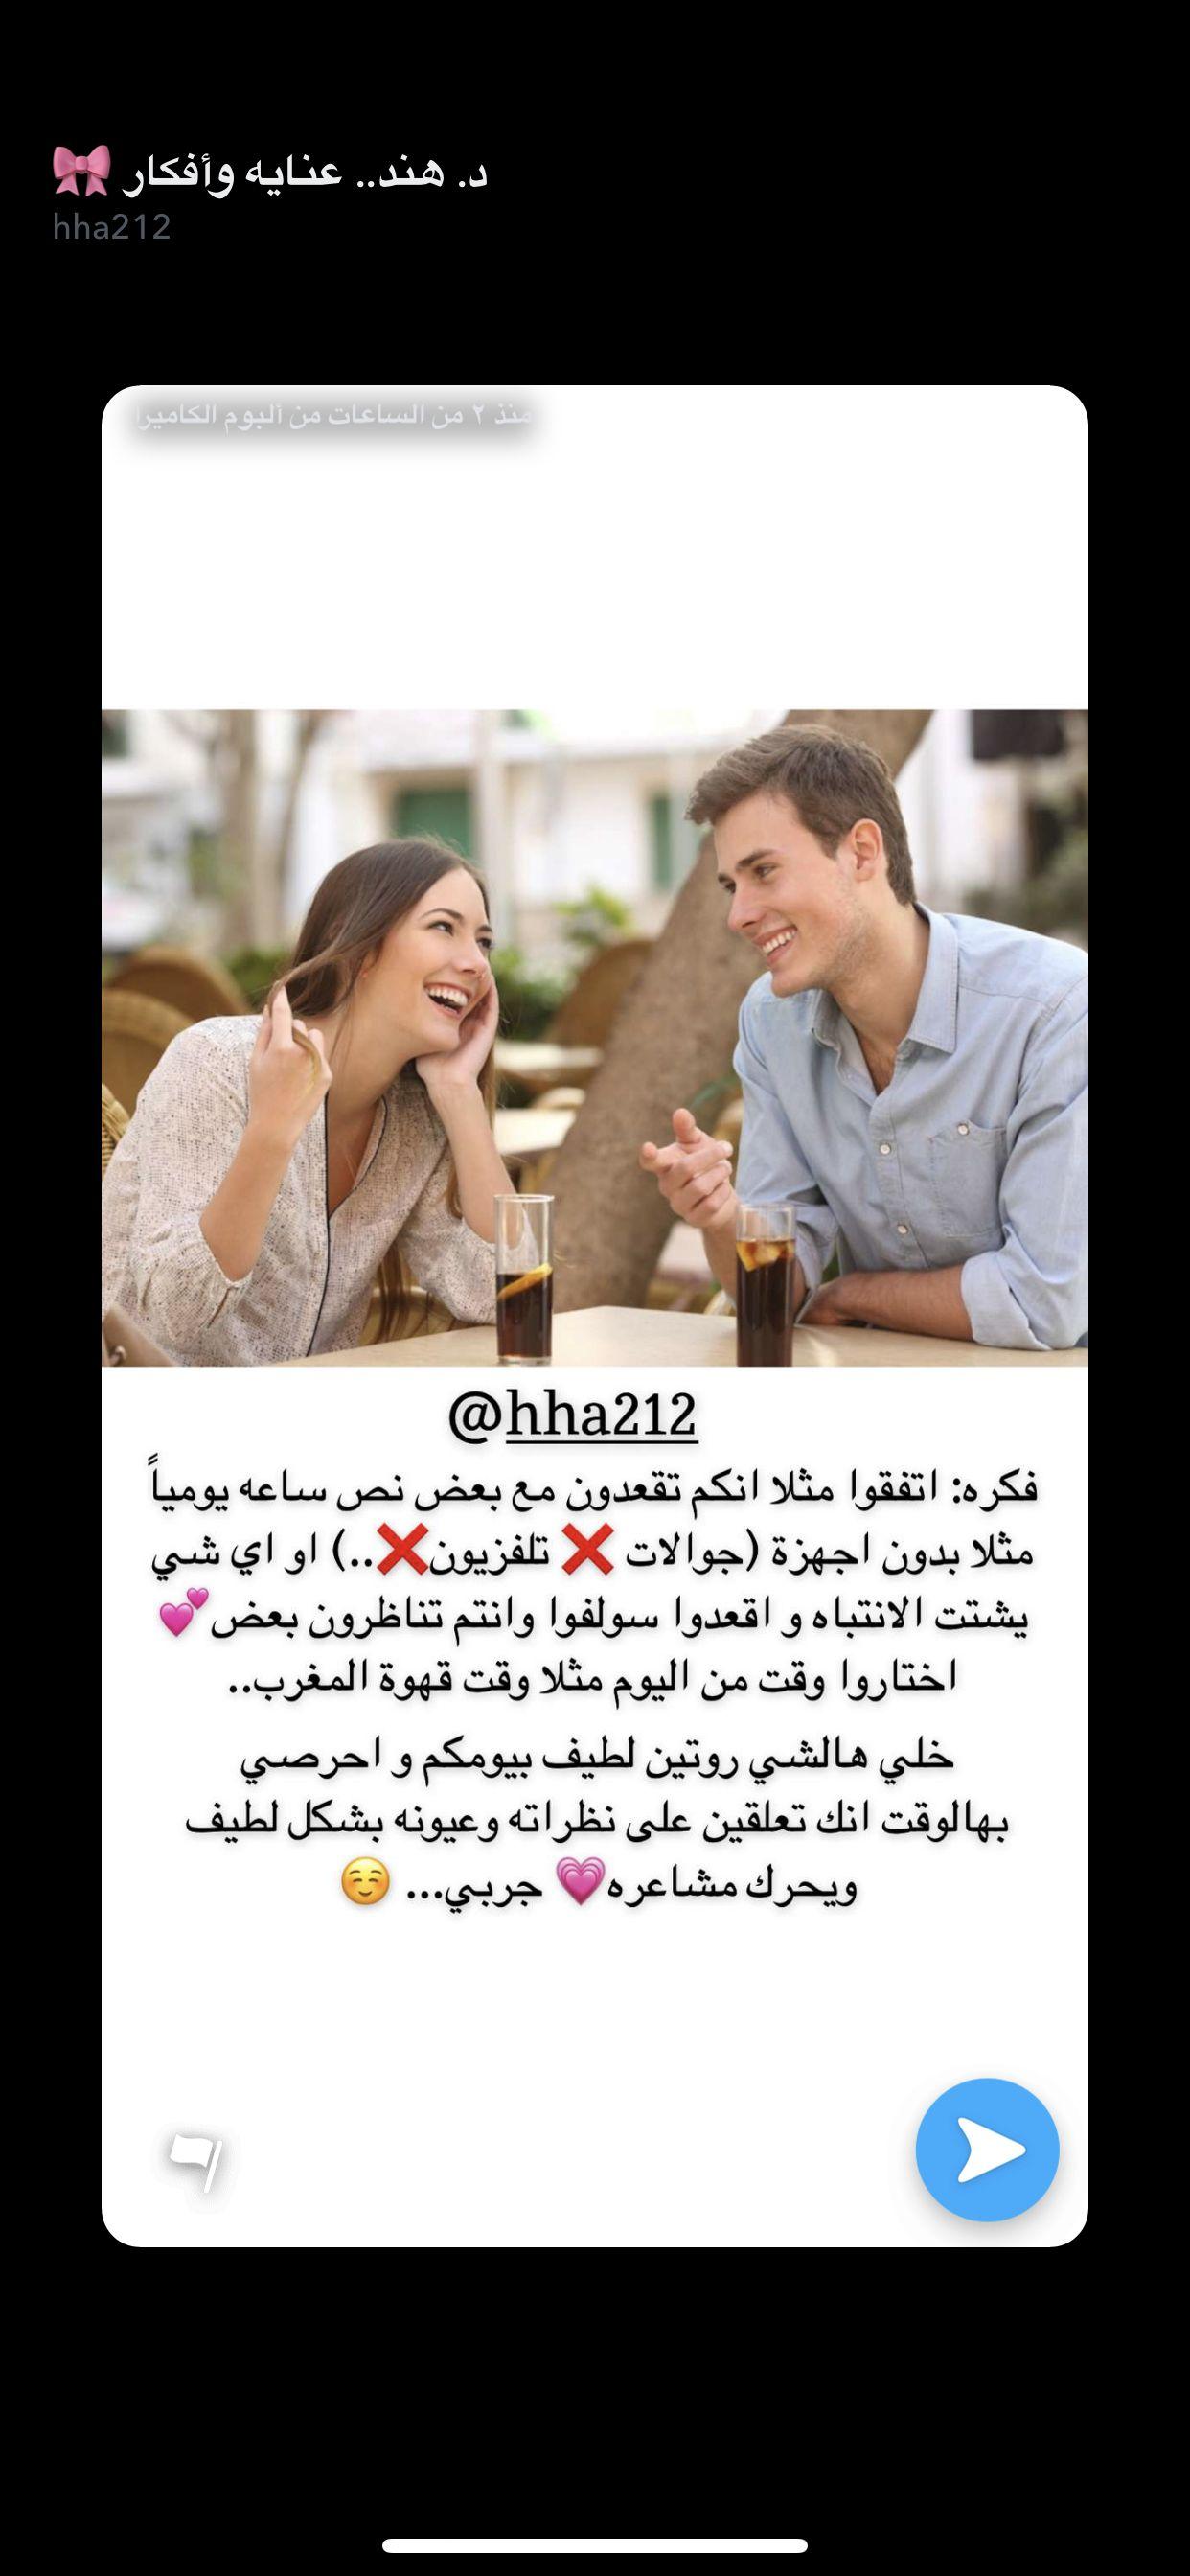 televiziune x dating)